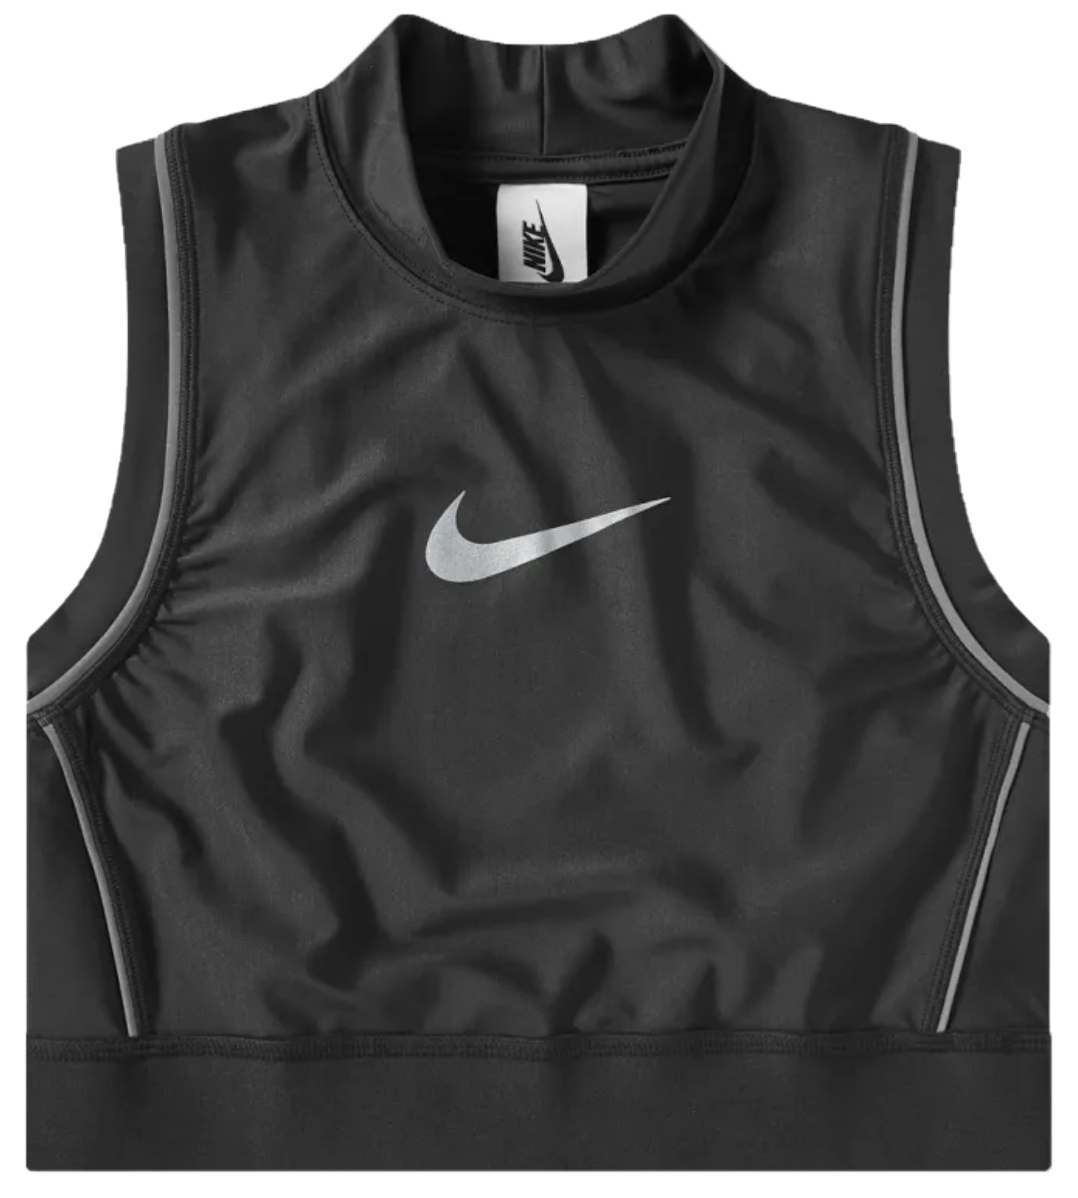 Nike x Ambush Women's Crop Top Black - FW18